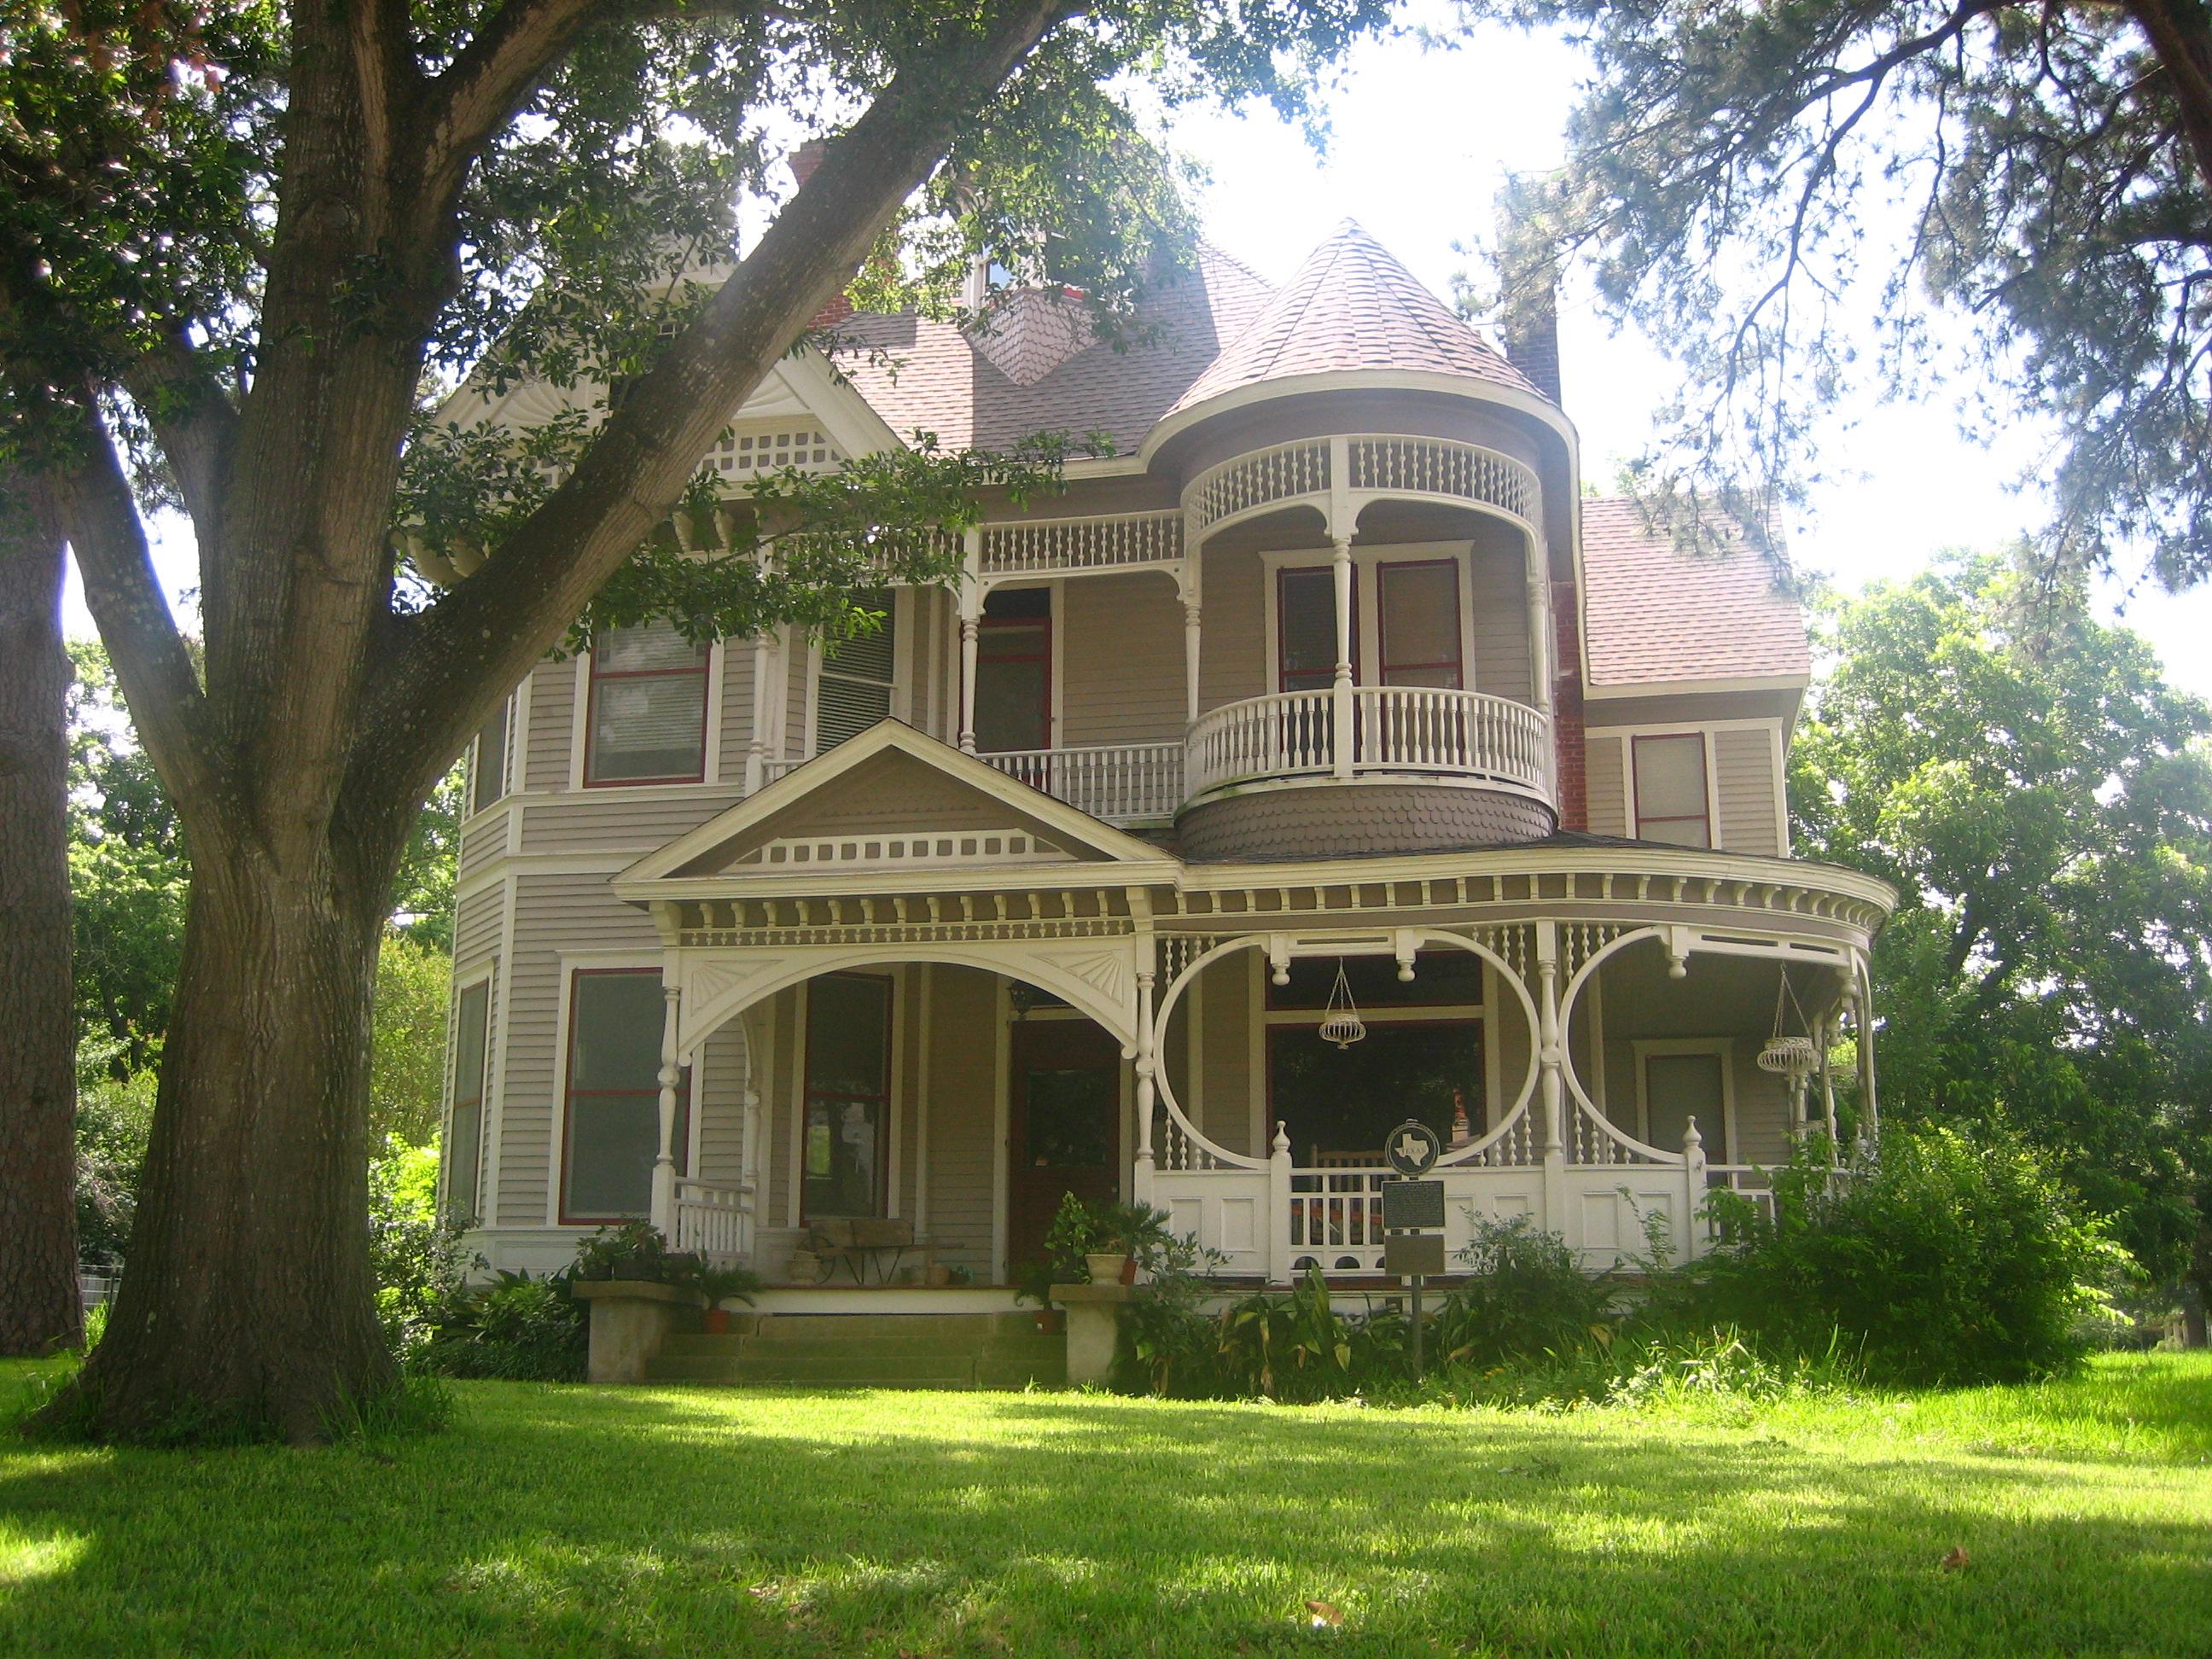 Caldwell (Texas)